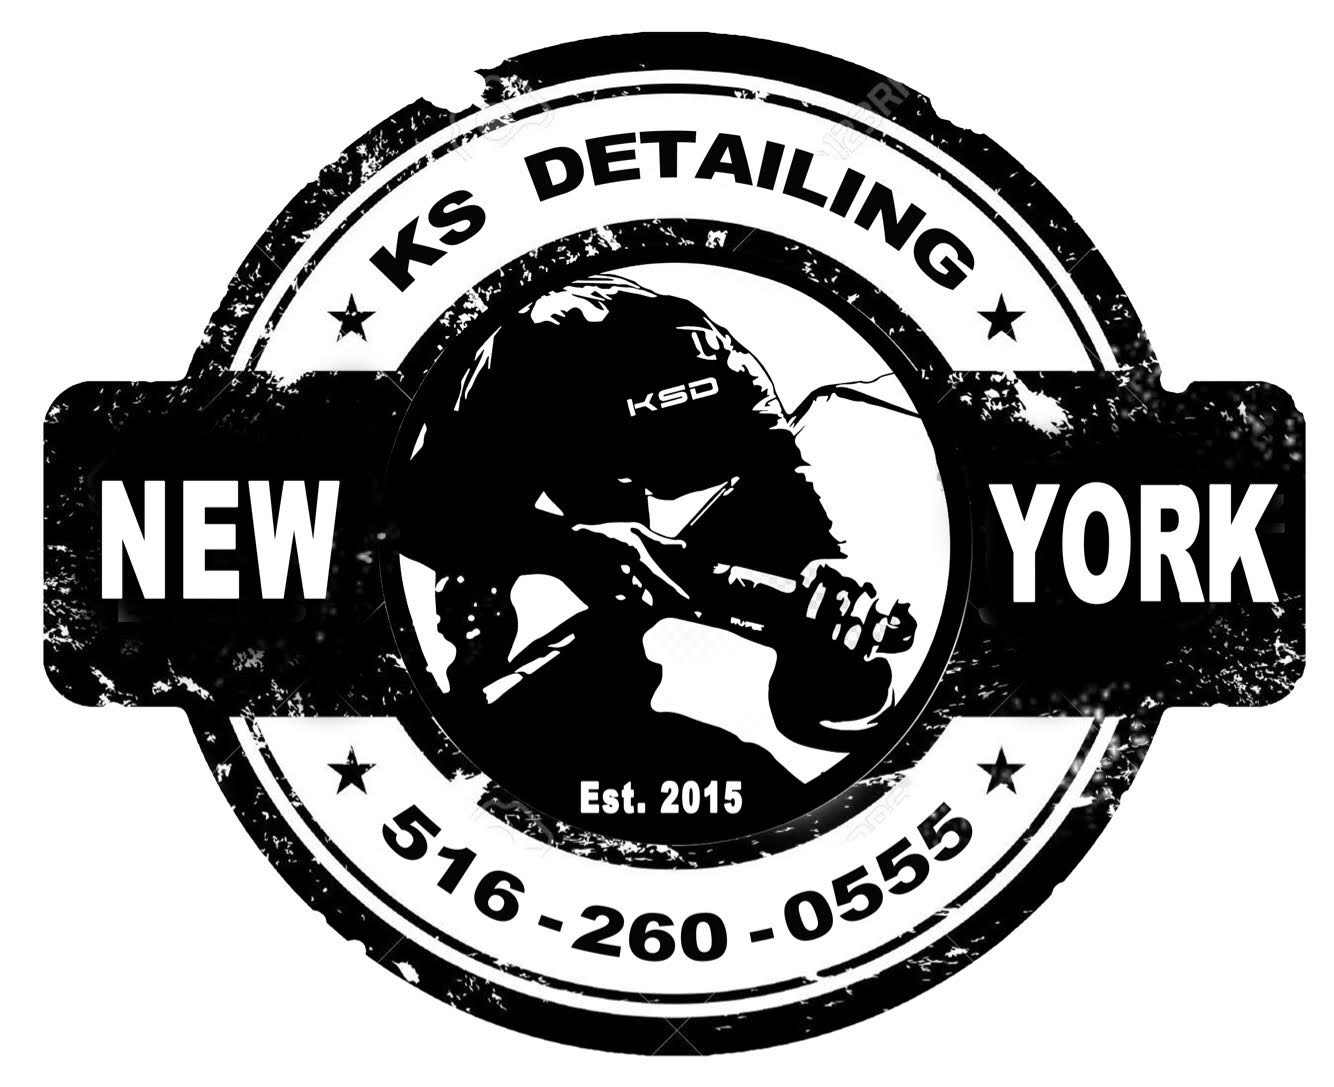 KS Detailing Long Island